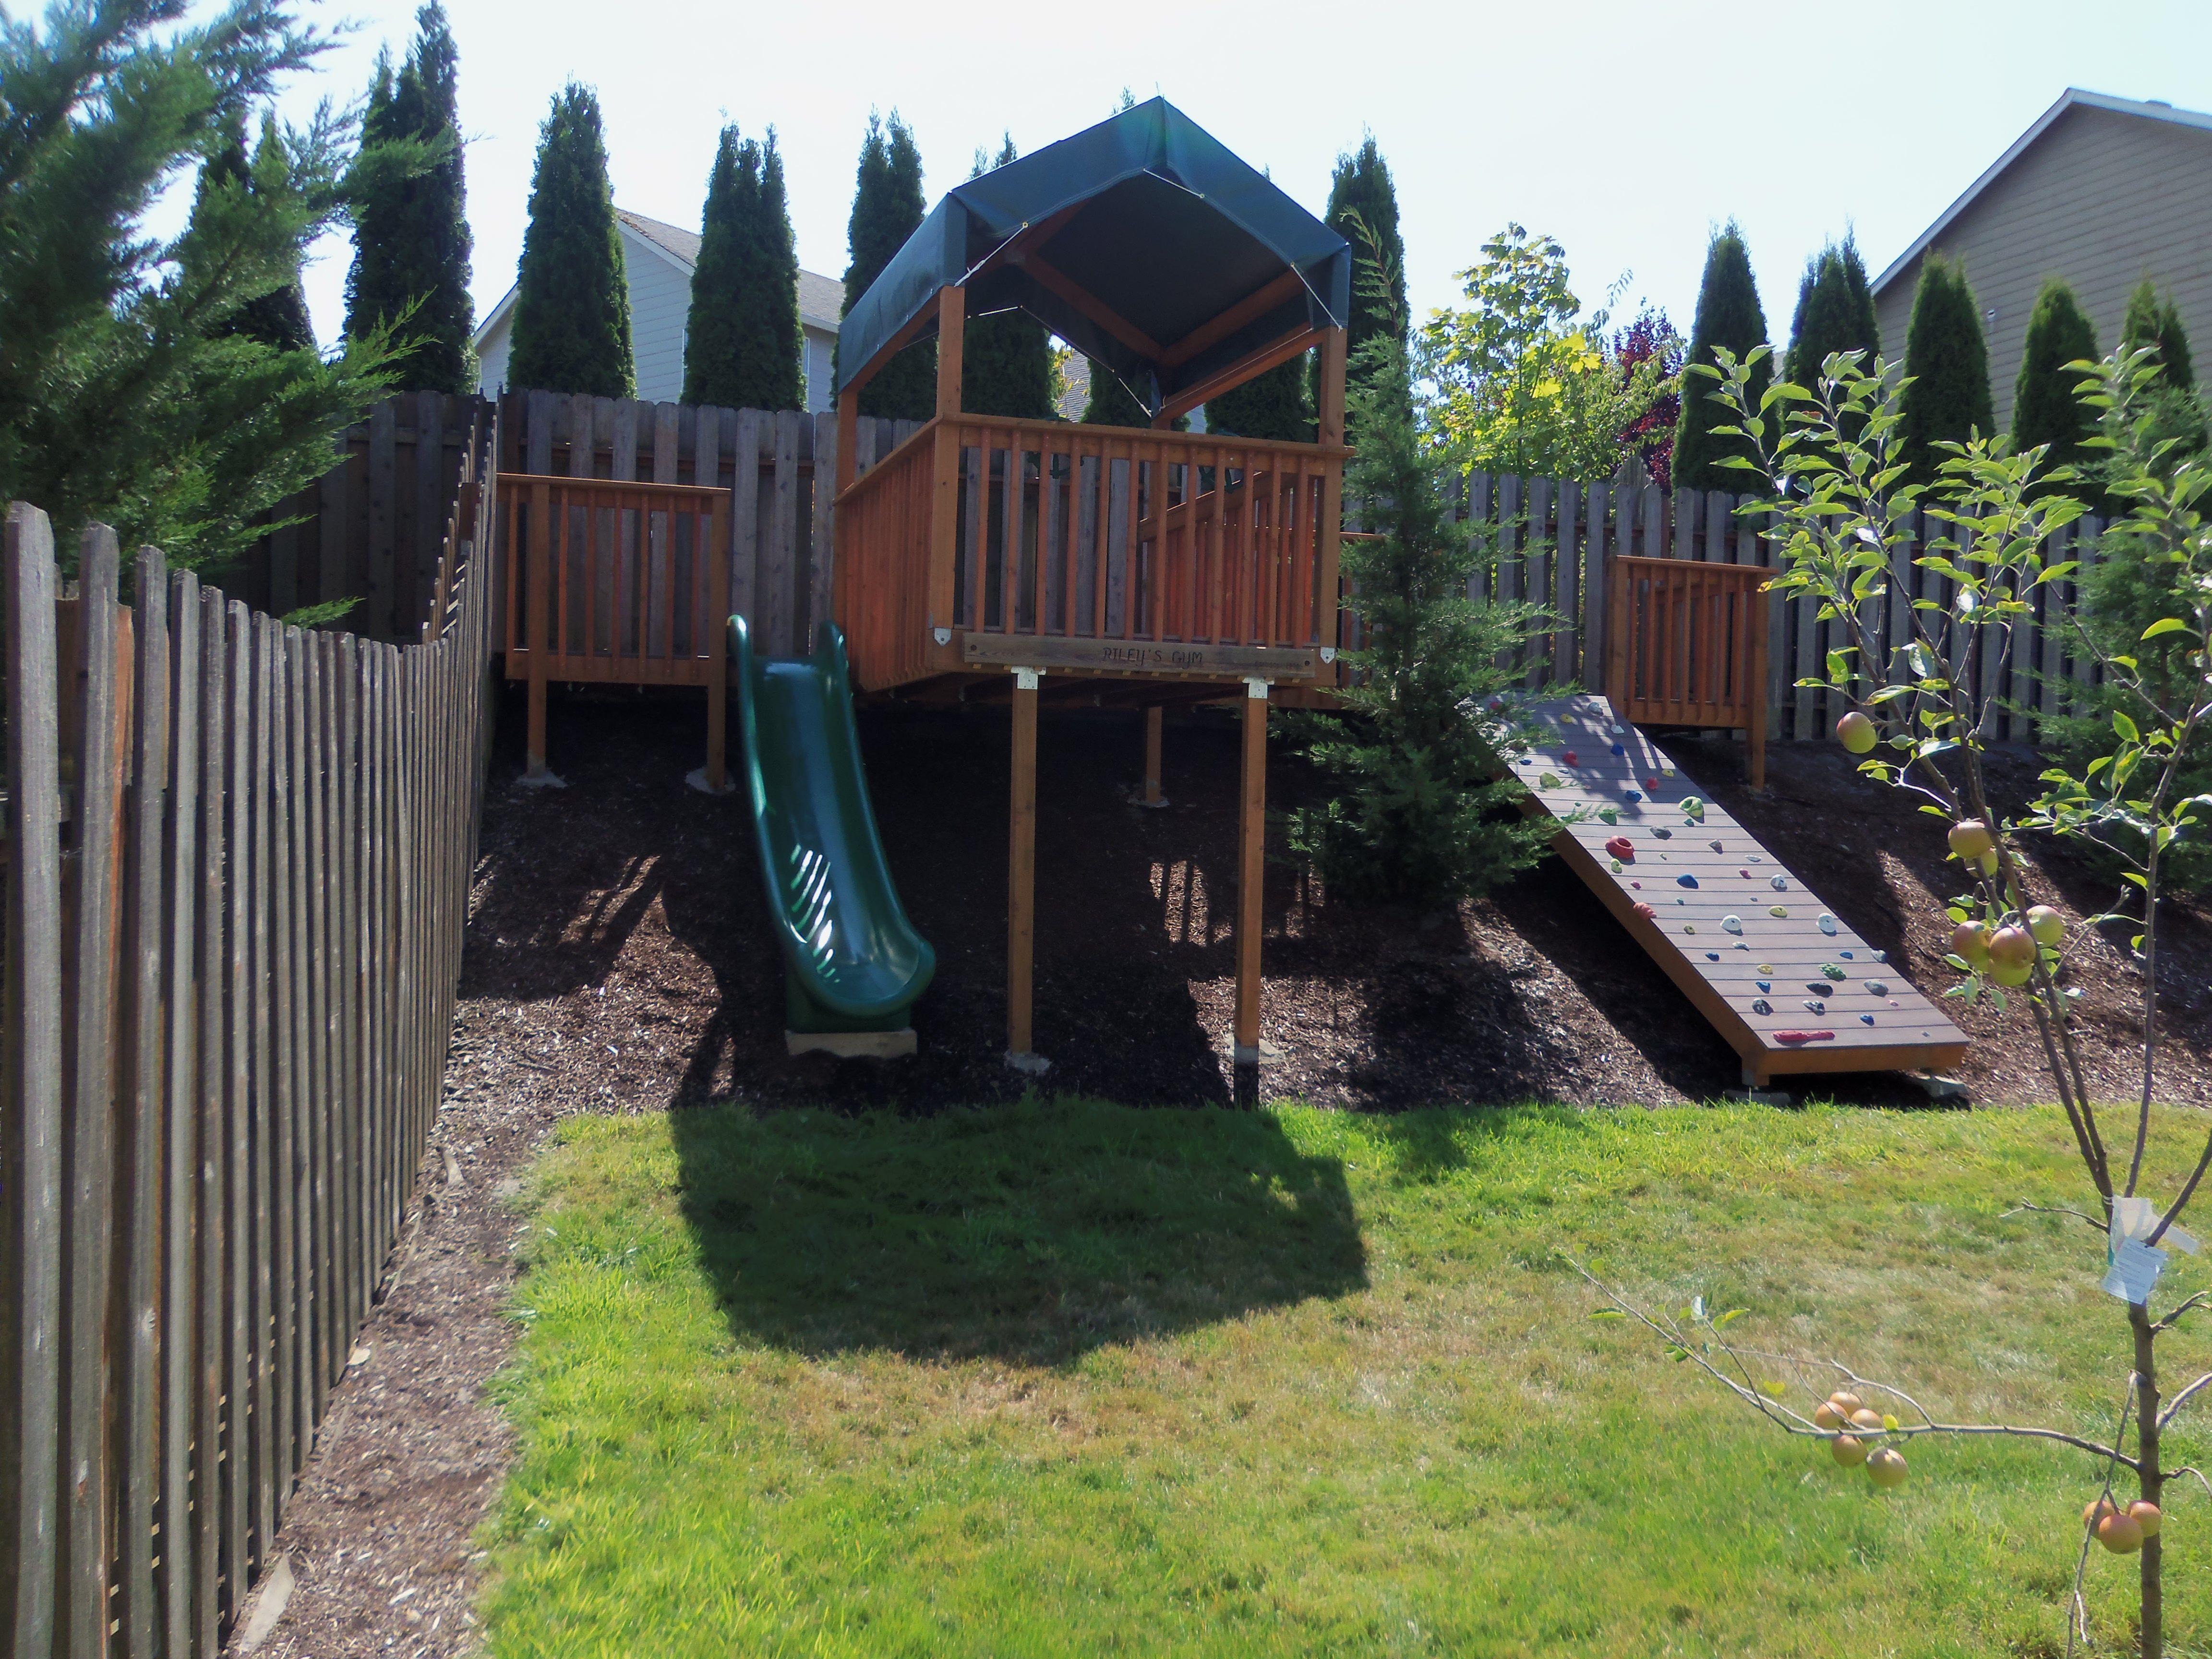 backyard hillside rock wall slide and play area sloped